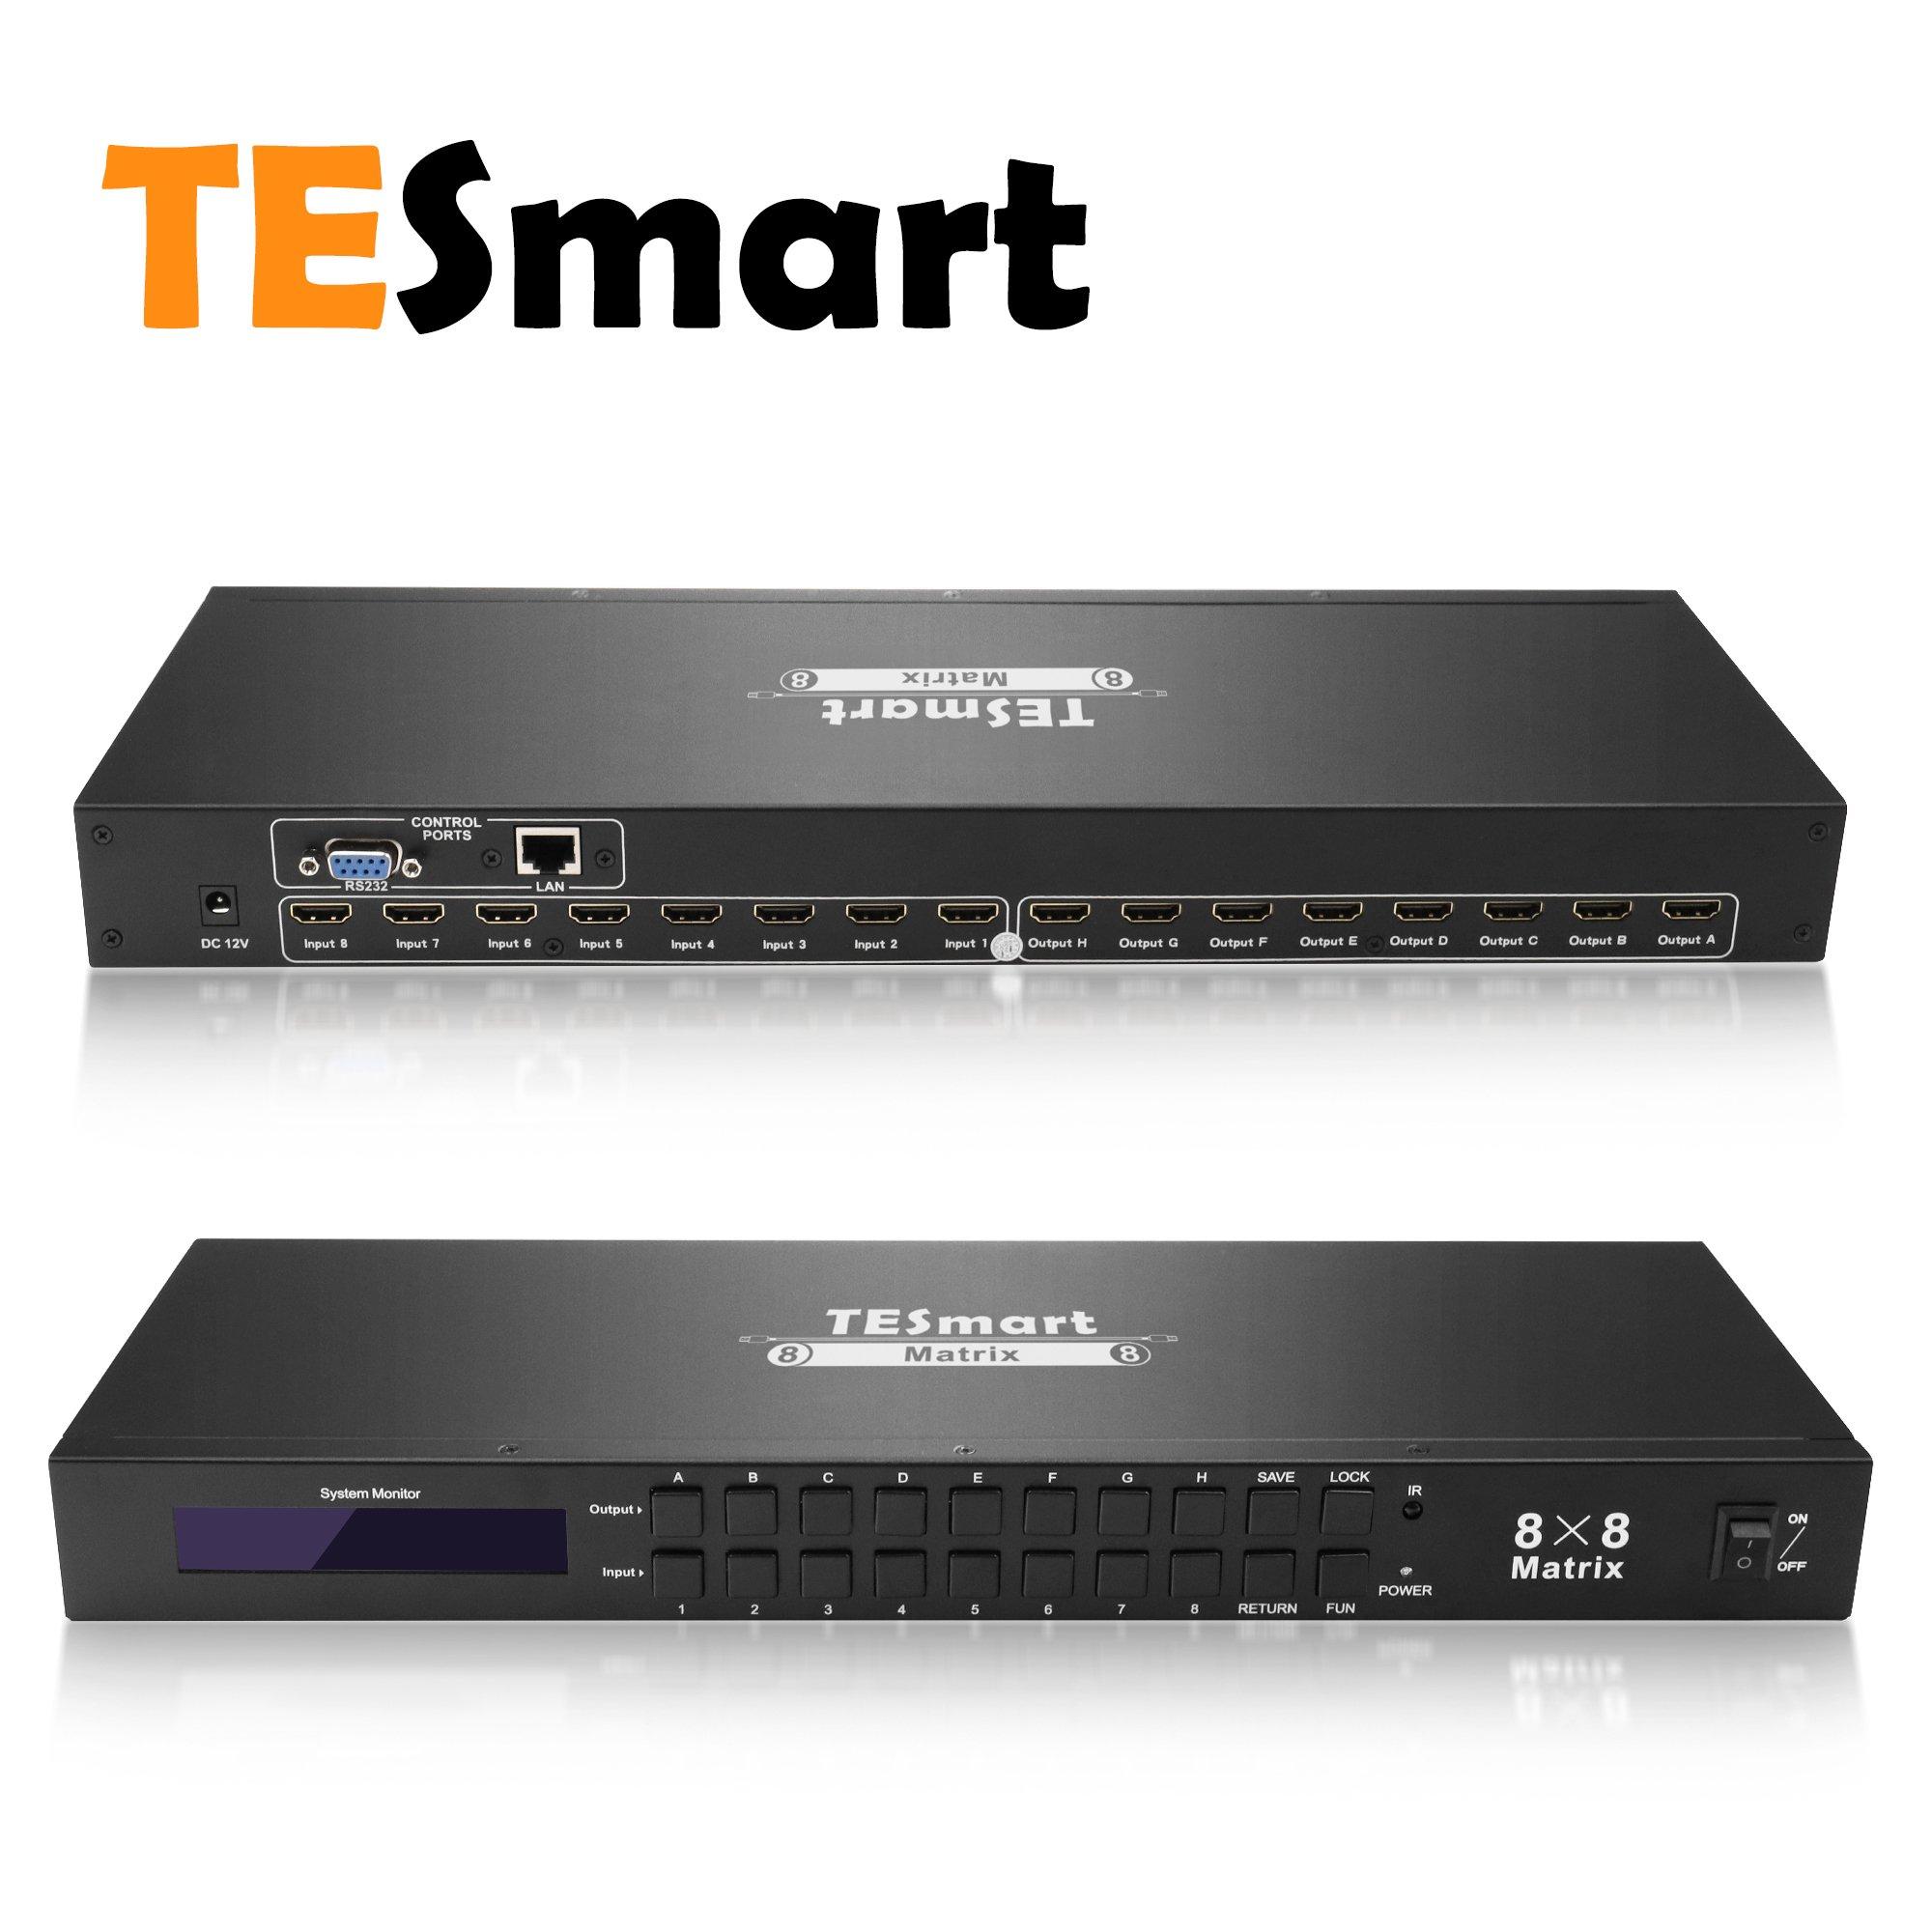 TESmart Rack Mount Ultra HD 4K HDMI 8X8 Matrix Switcher Supports 4Kx2K@30HZ,1080P@60Hz,3D&Deep Color,LAN Port Control,HDMI 1.4